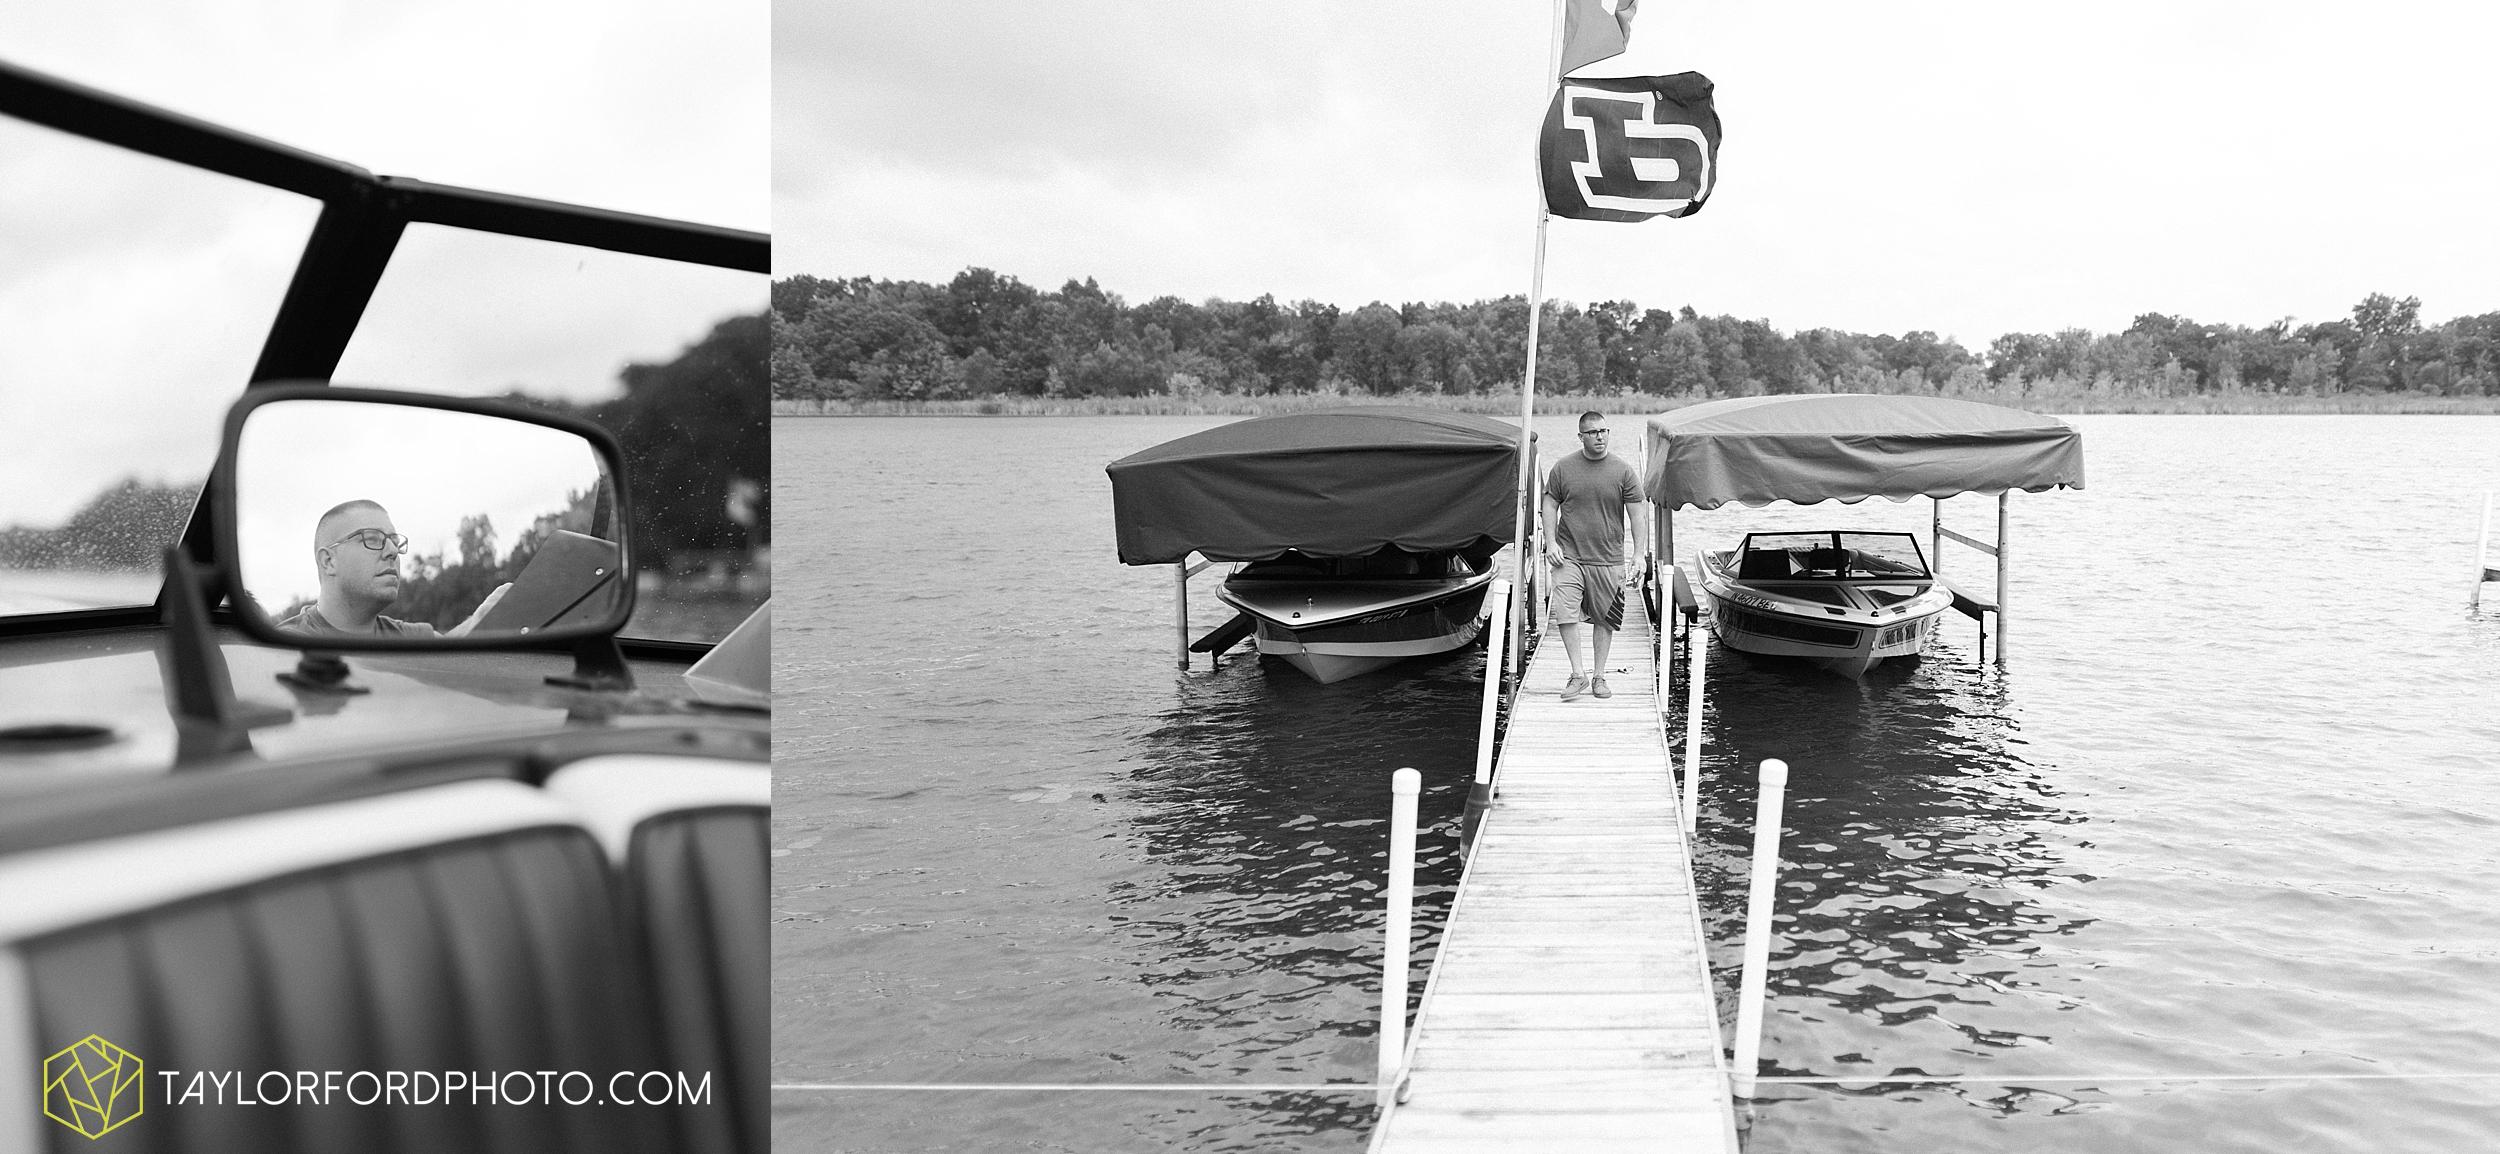 brook-loren-pokagon-state-park-angola-indiana-potowatomi-inn-wedding-fall-lake-james-photographer-taylor-ford-photography_0488.jpg